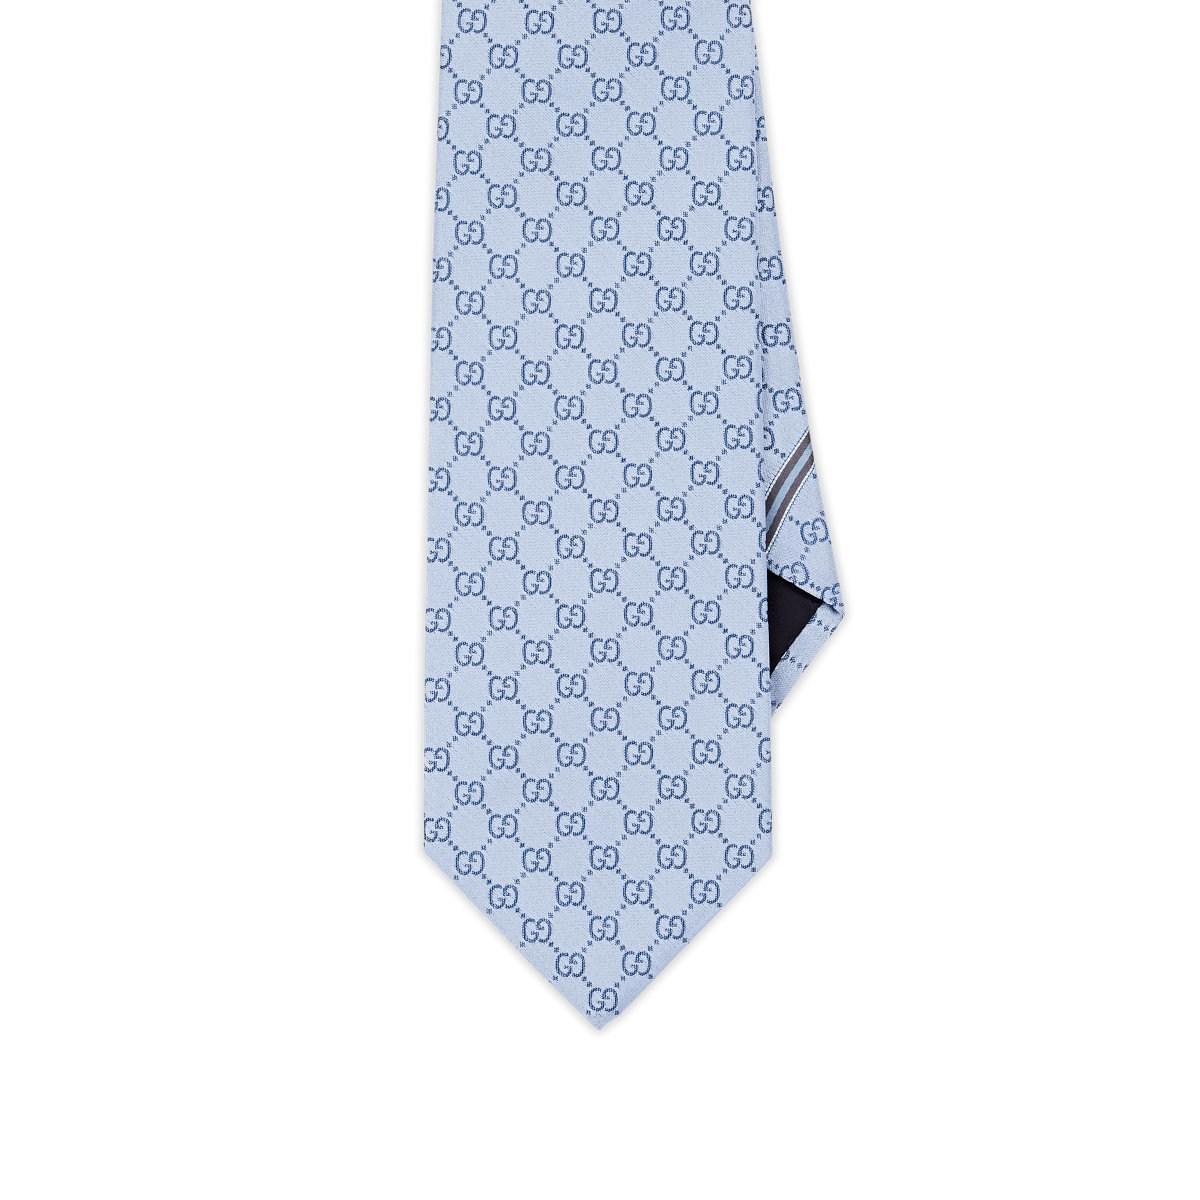 b189c13812a Gucci - Blue GG-Pattern Silk Jacquard Necktie for Men - Lyst. View  fullscreen